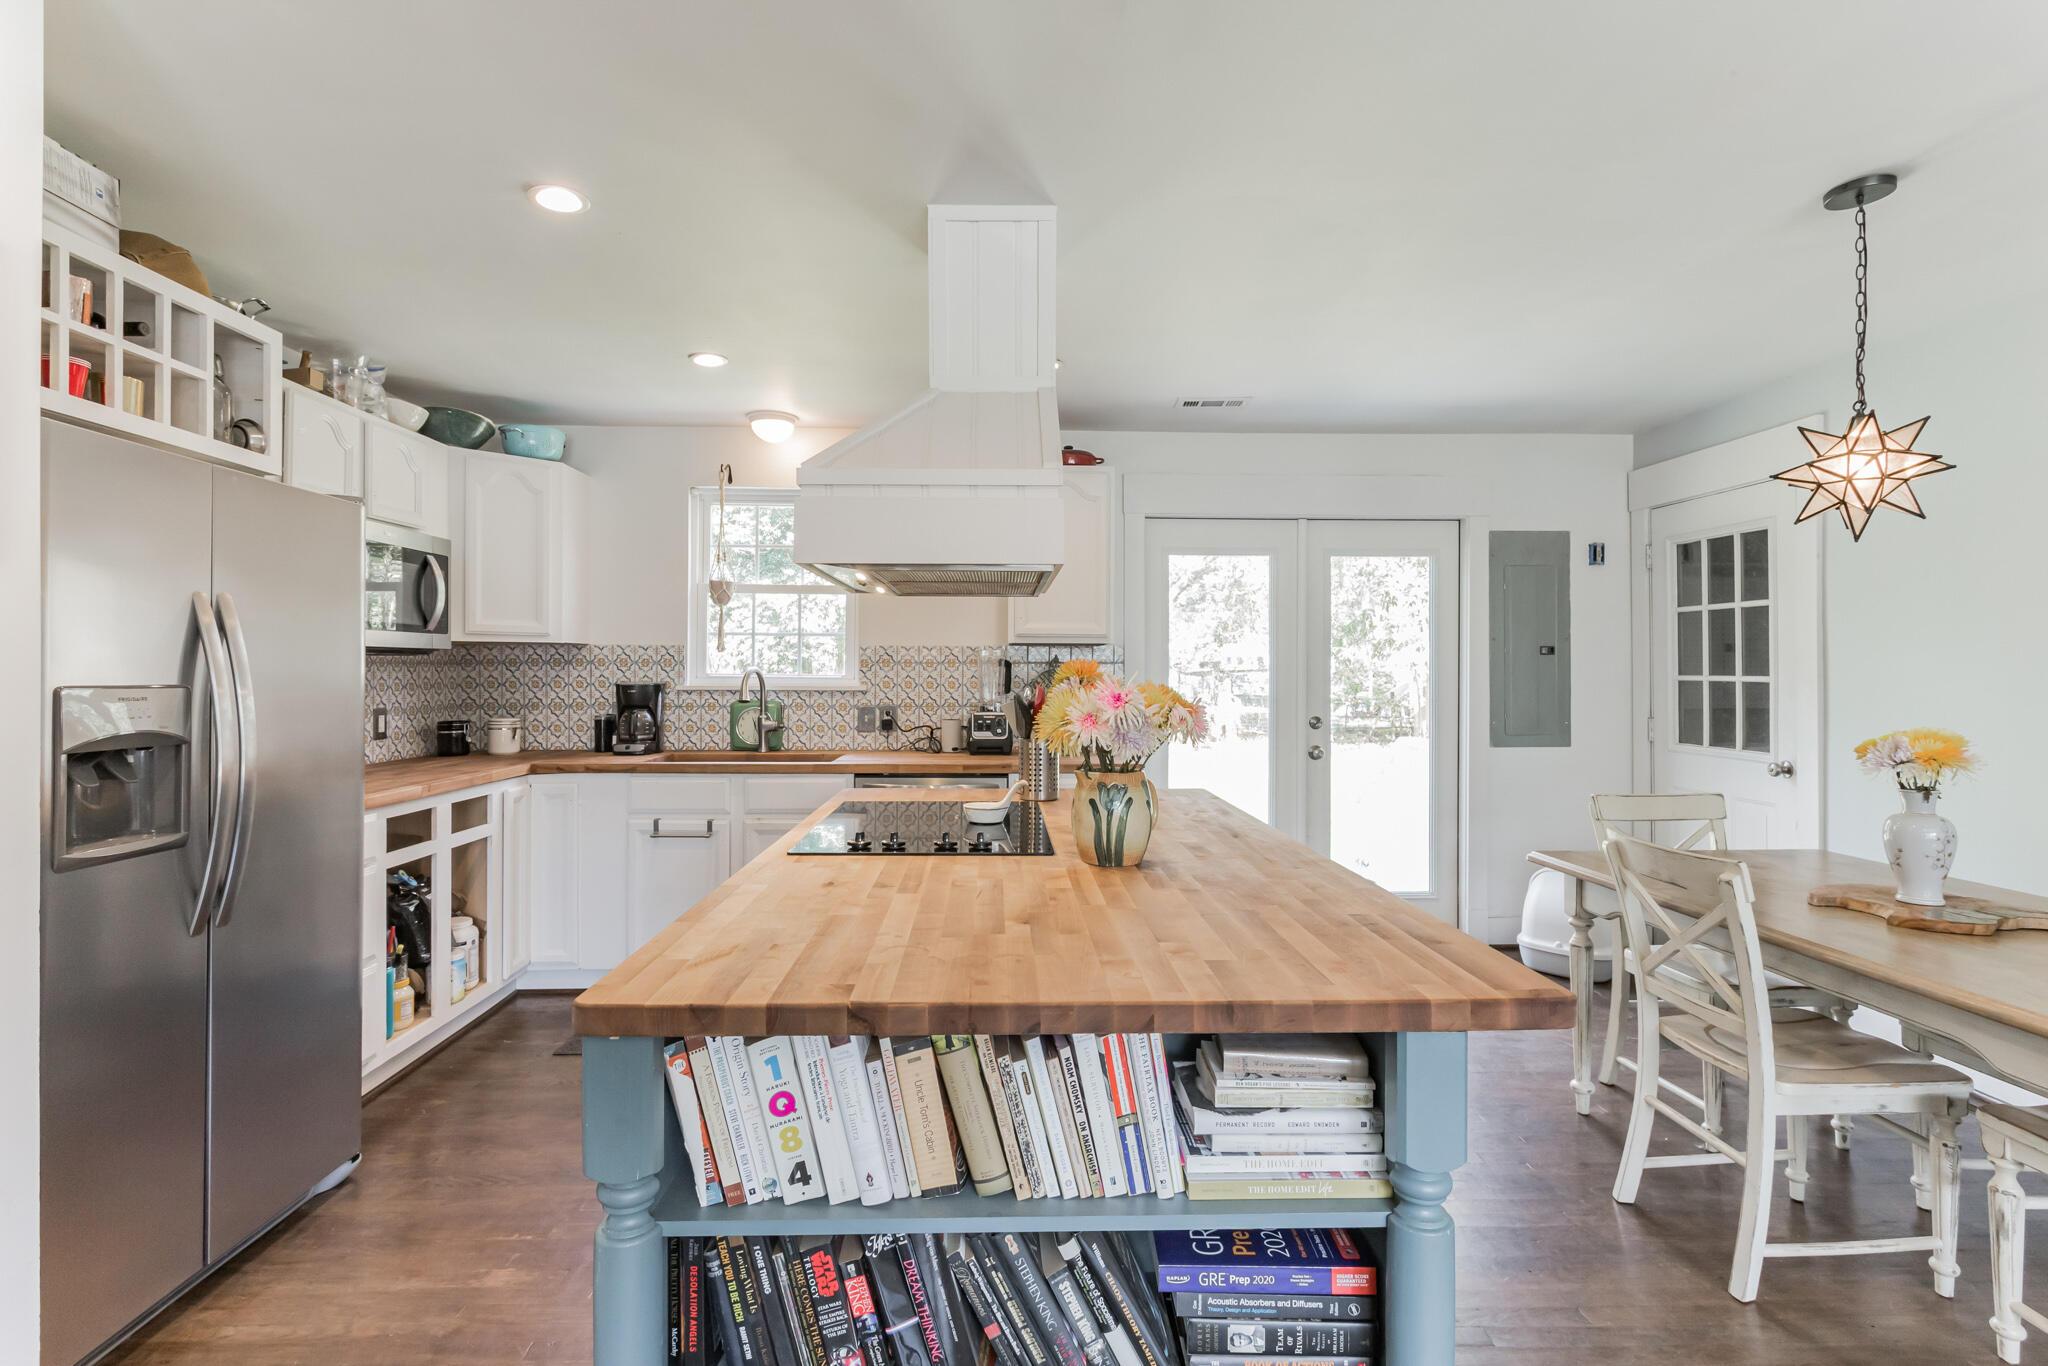 Stafford Heights Homes For Sale - 3472 Cynthia, Johns Island, SC - 3